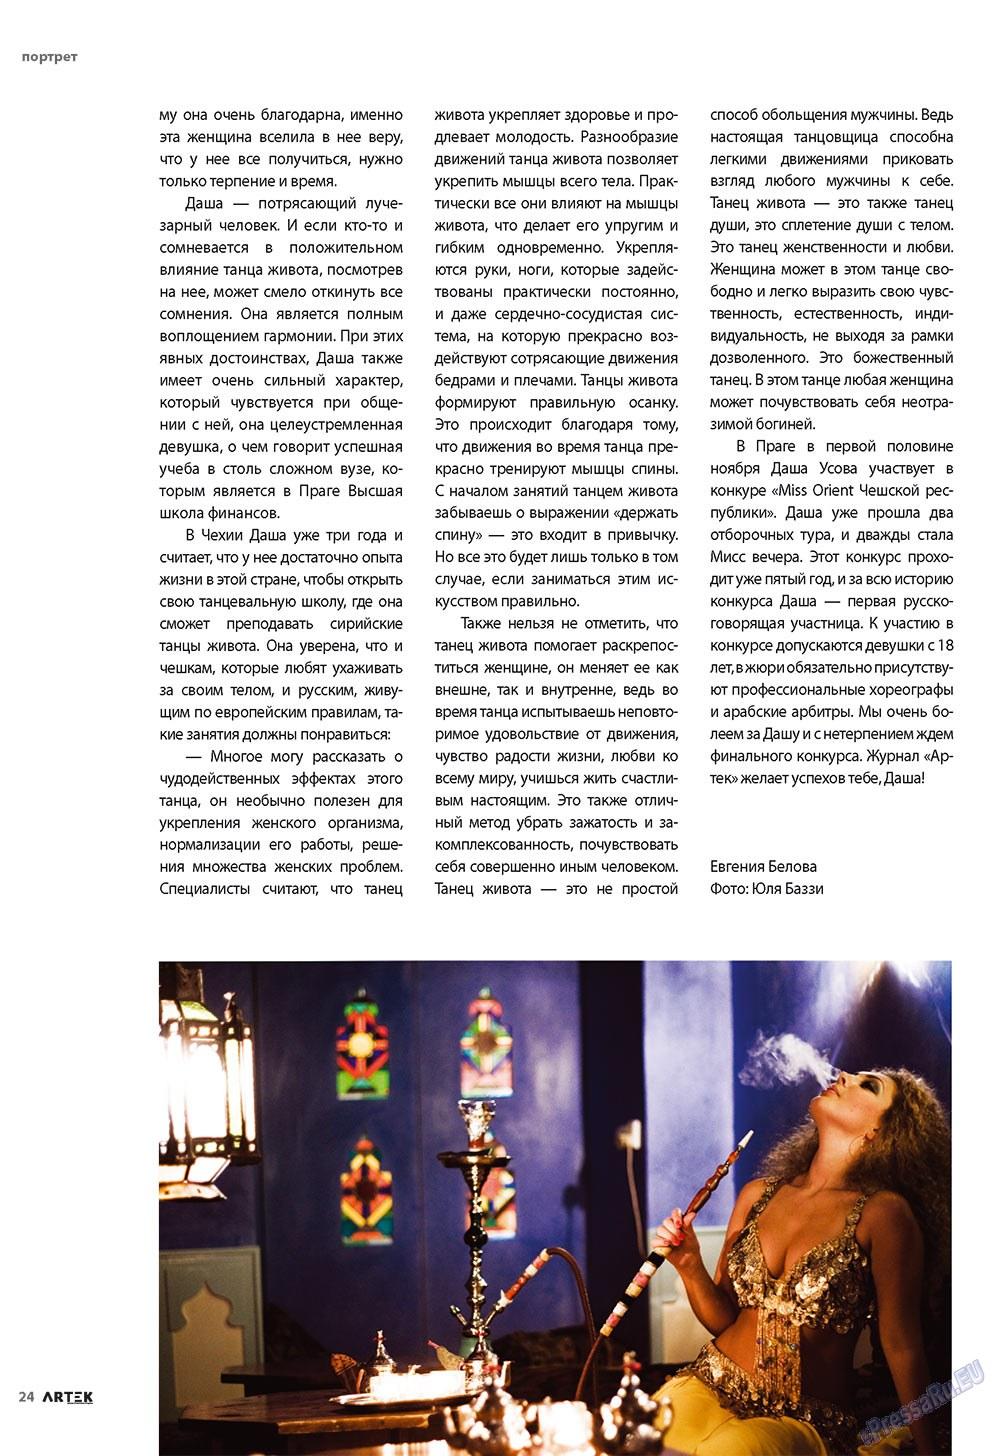 Артек (журнал). 2009 год, номер 5, стр. 24